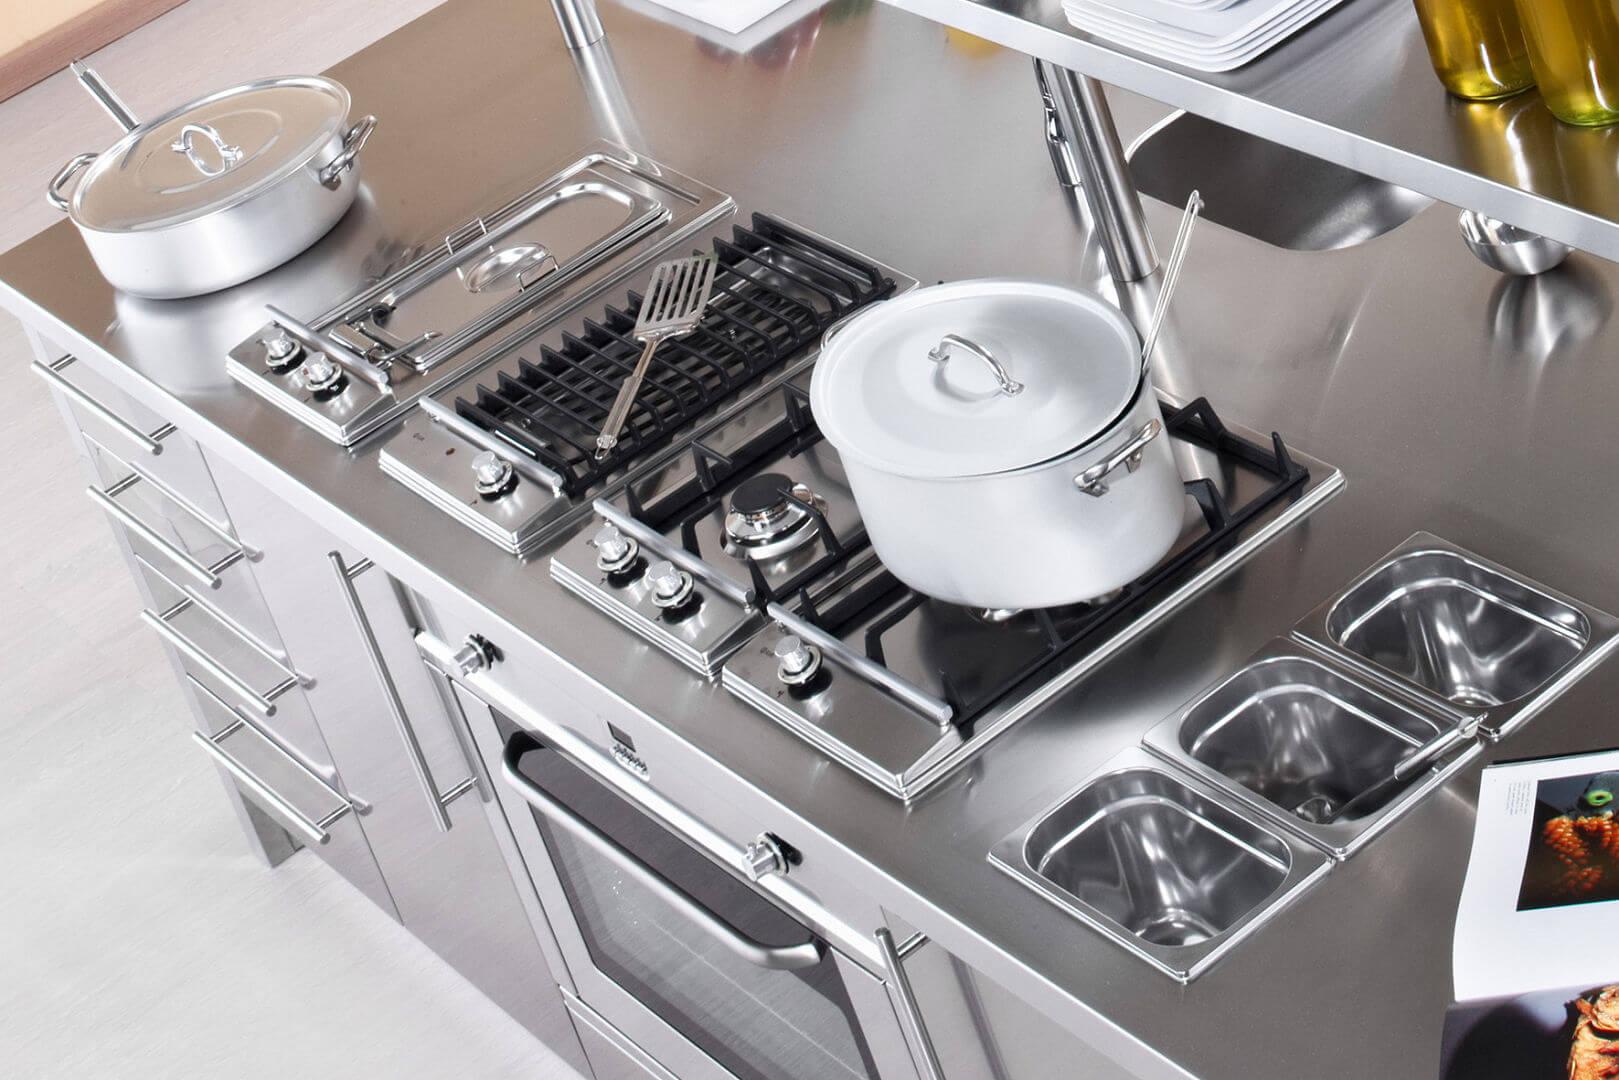 Work station arca cucine italia cucine in acciaio inox - Mobile lavello cucina leroy merlin ...